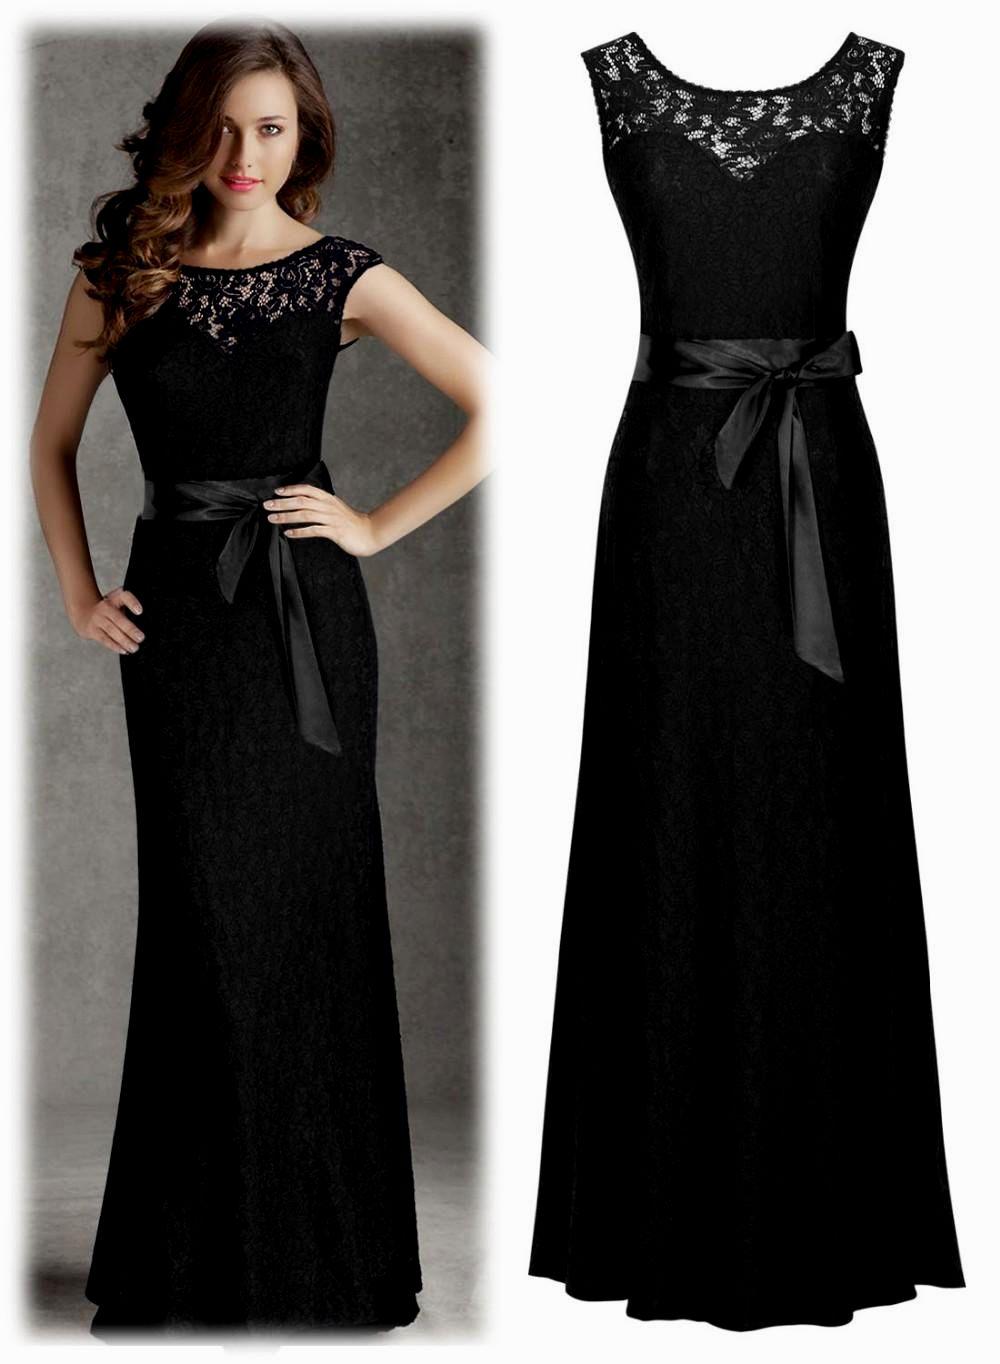 dresses for black tie wedding photo - 1